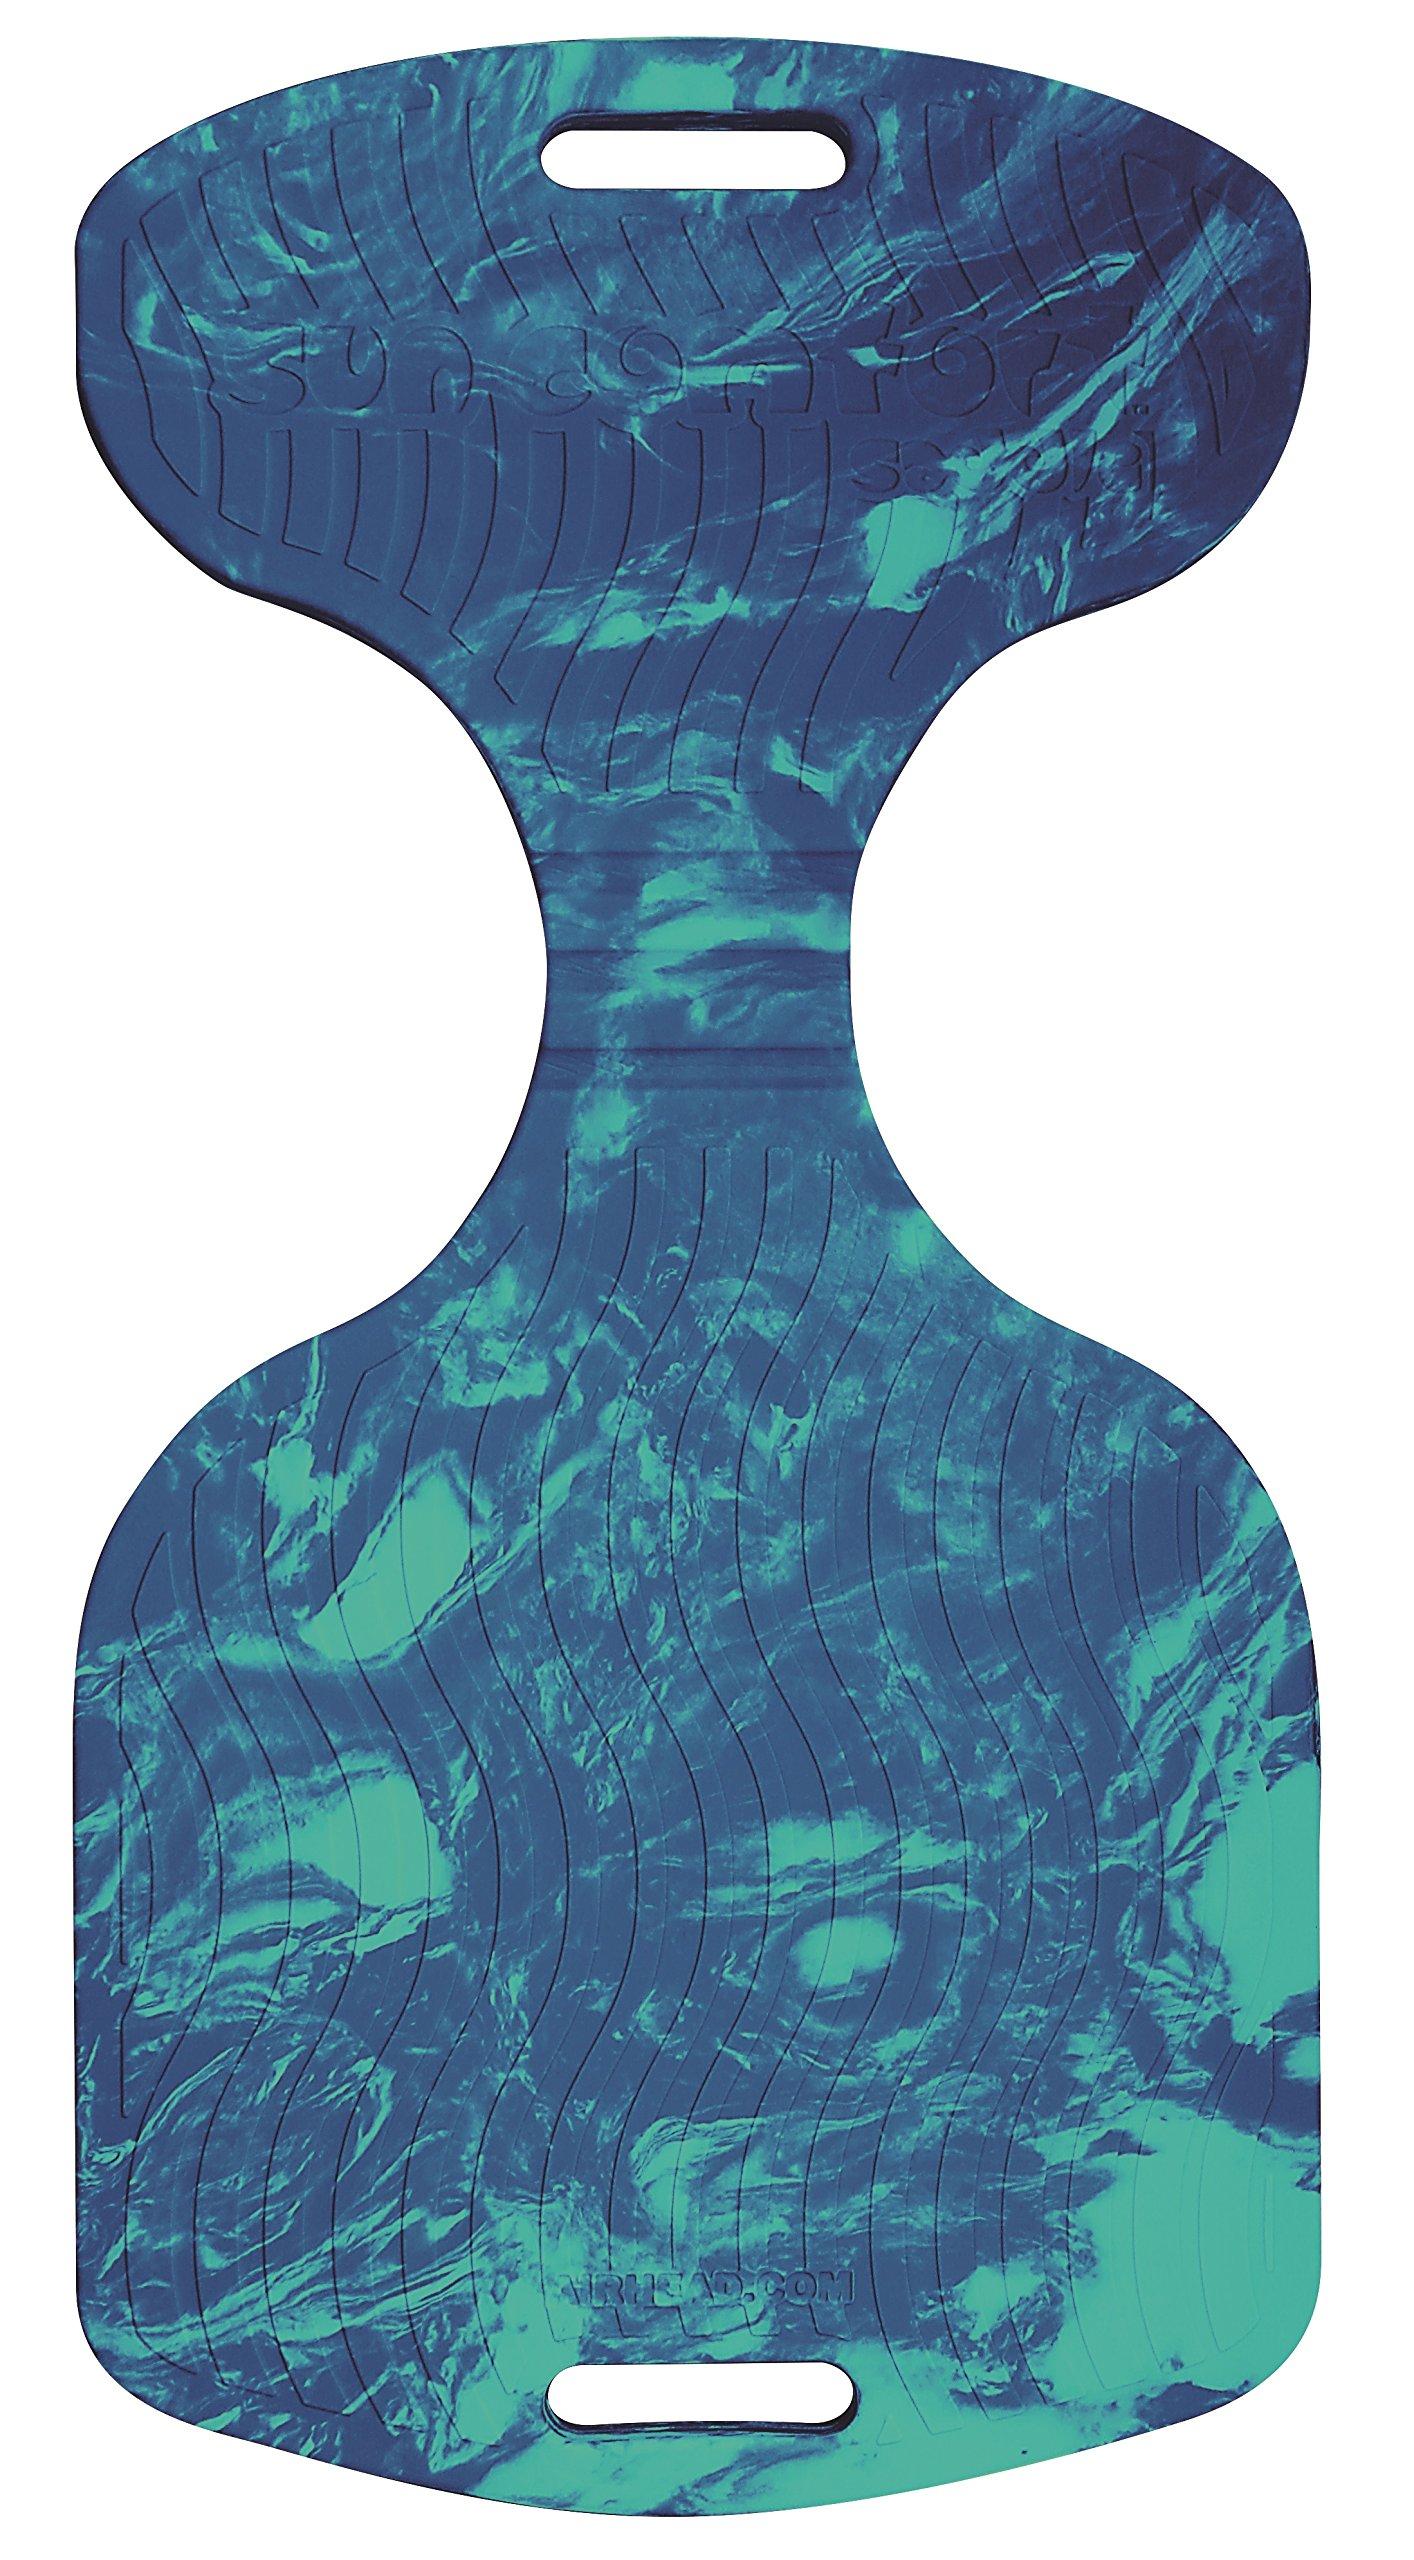 Airhead Sun Comfort Pool Saddle, Sapphire, 32'' x 16'' x 1.25''